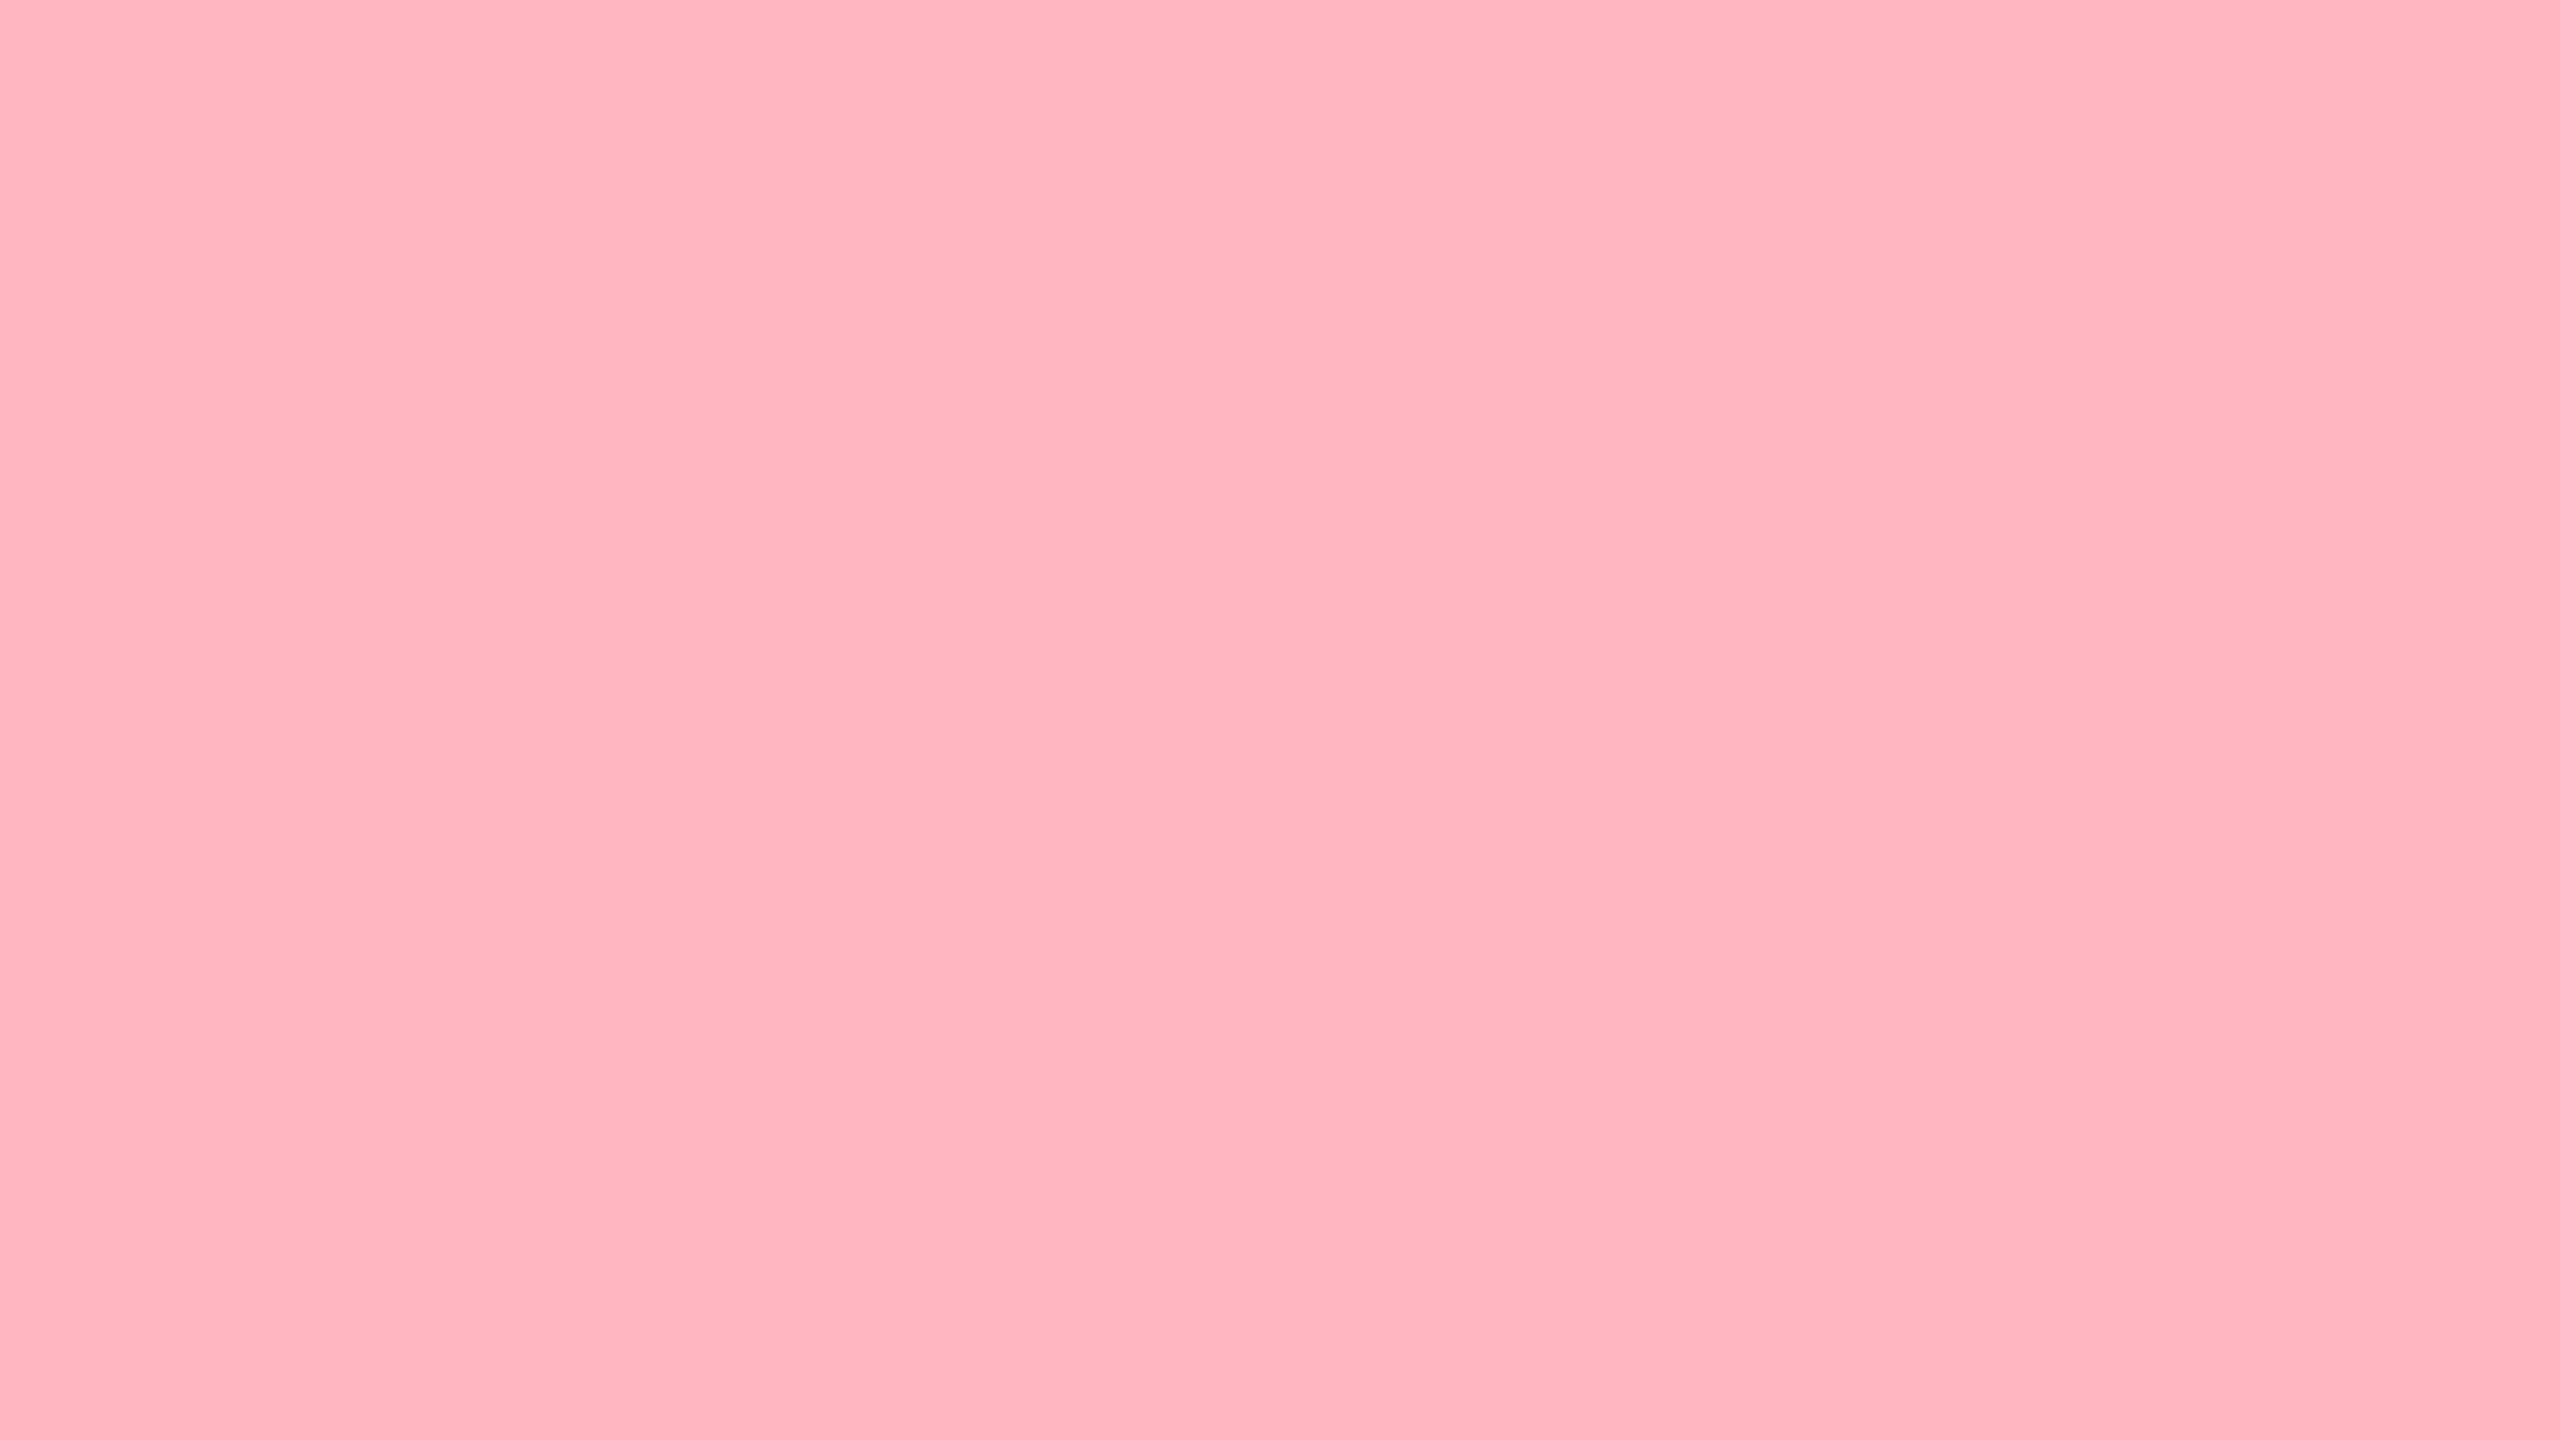 Cute light pink wallpapers wallpapersafari - Pastel pink wallpaper hd ...